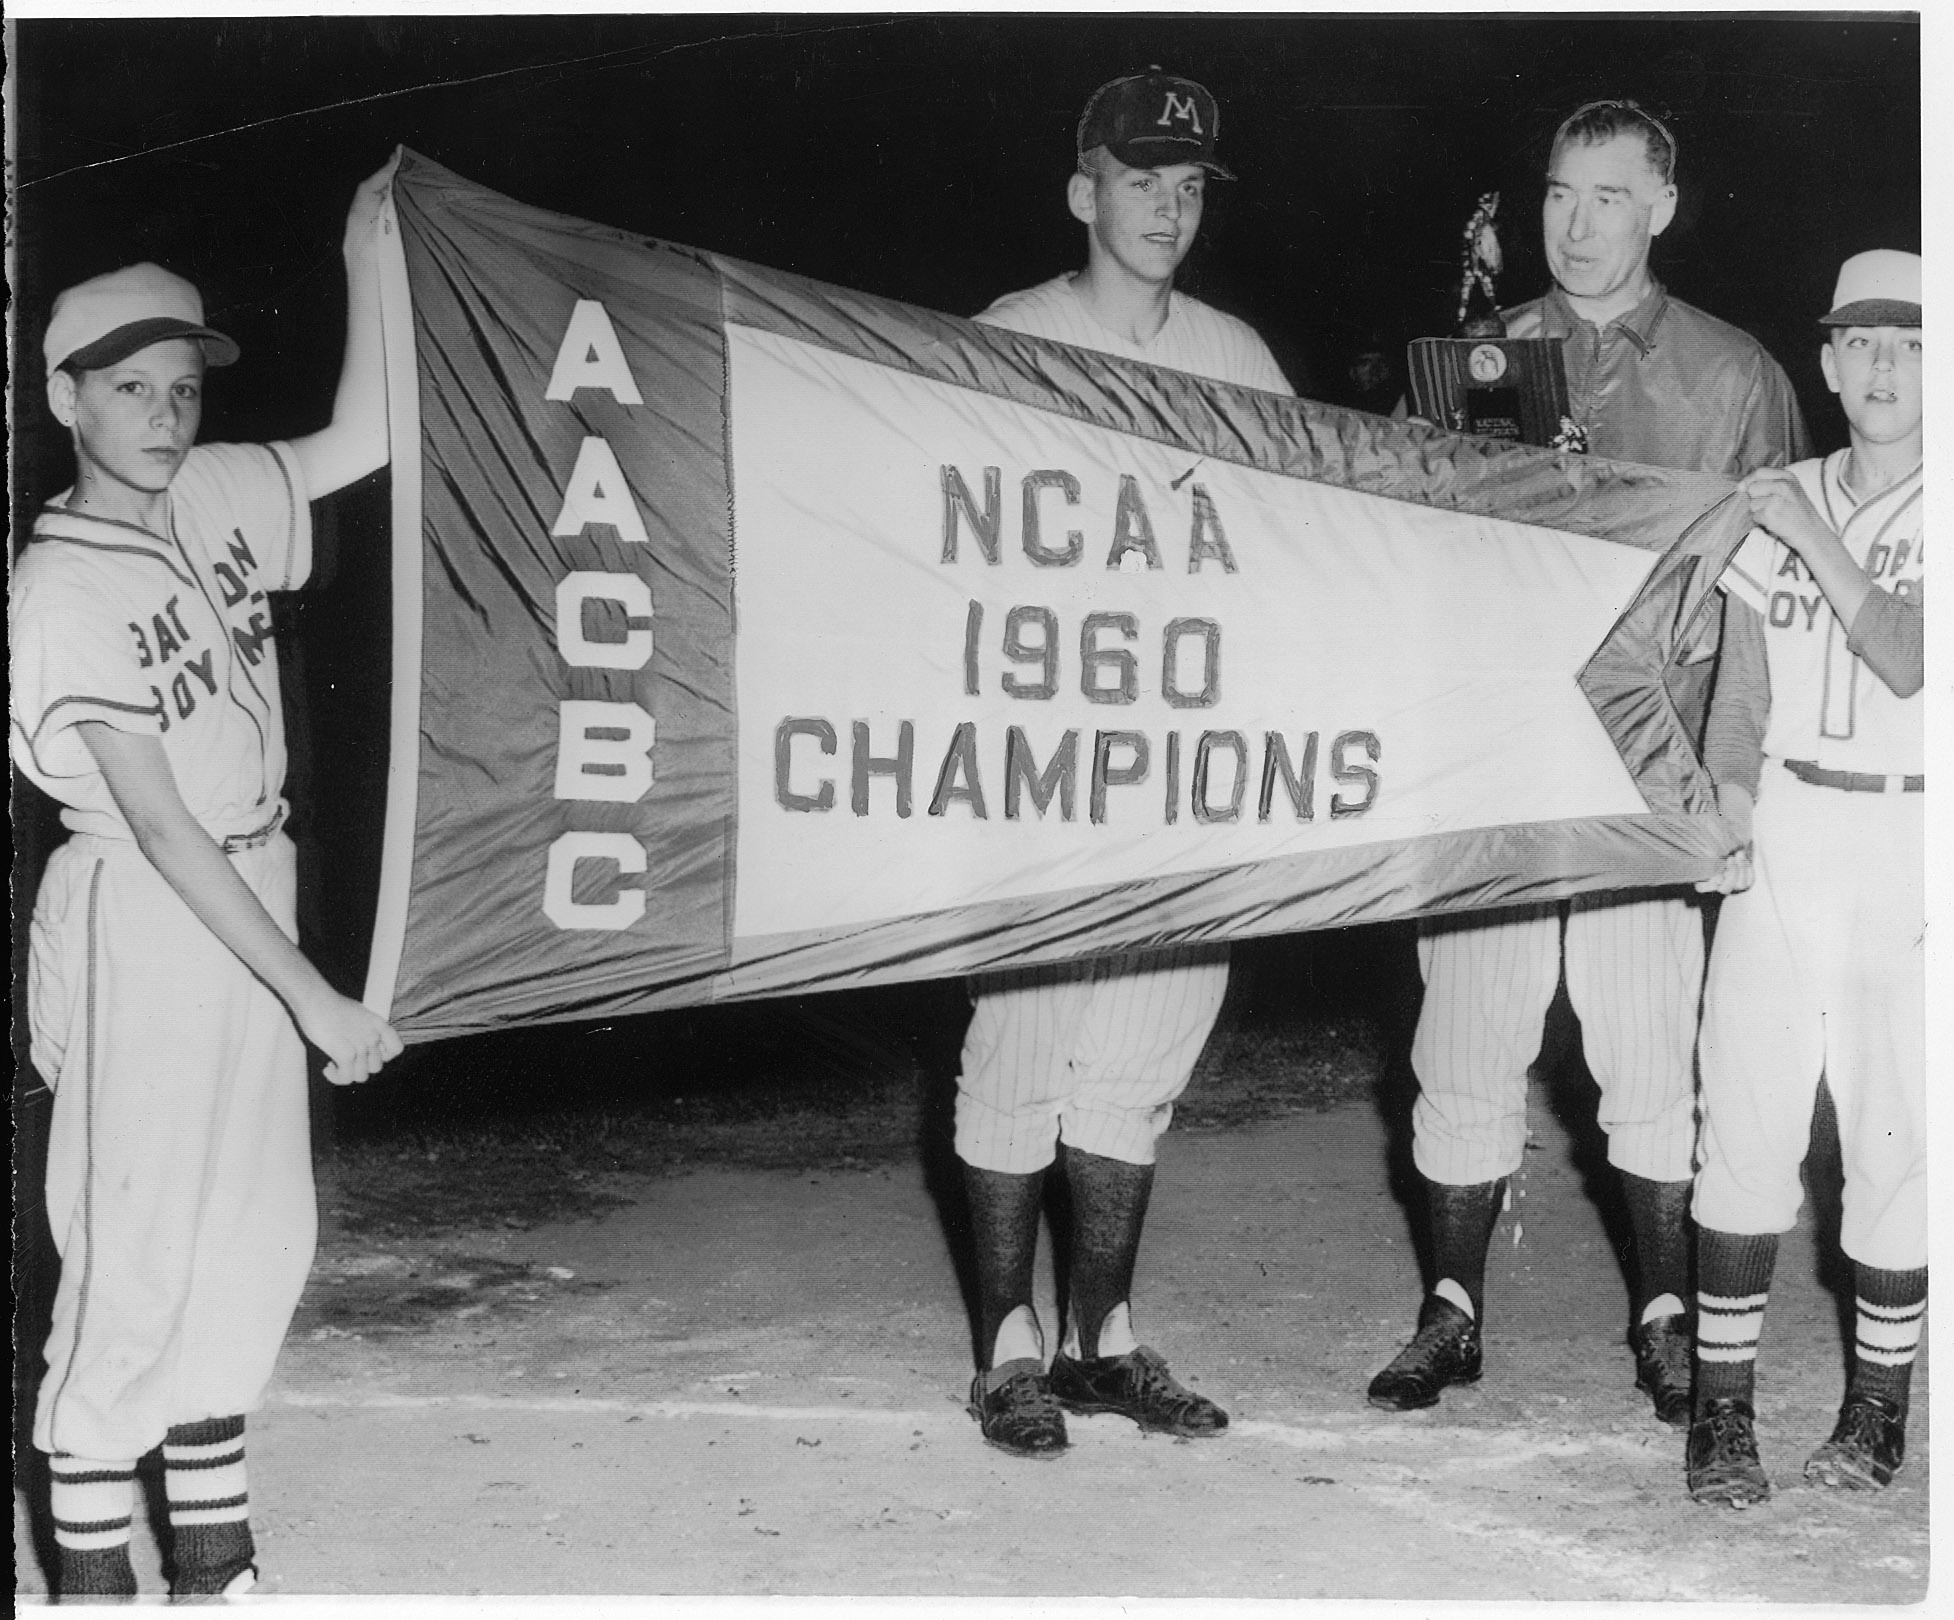 Batboys Don Noel and Dave Benson held up a 1960 NCAA championship flag for Gophers team MVP John Erickson and coach Dick Siebert.